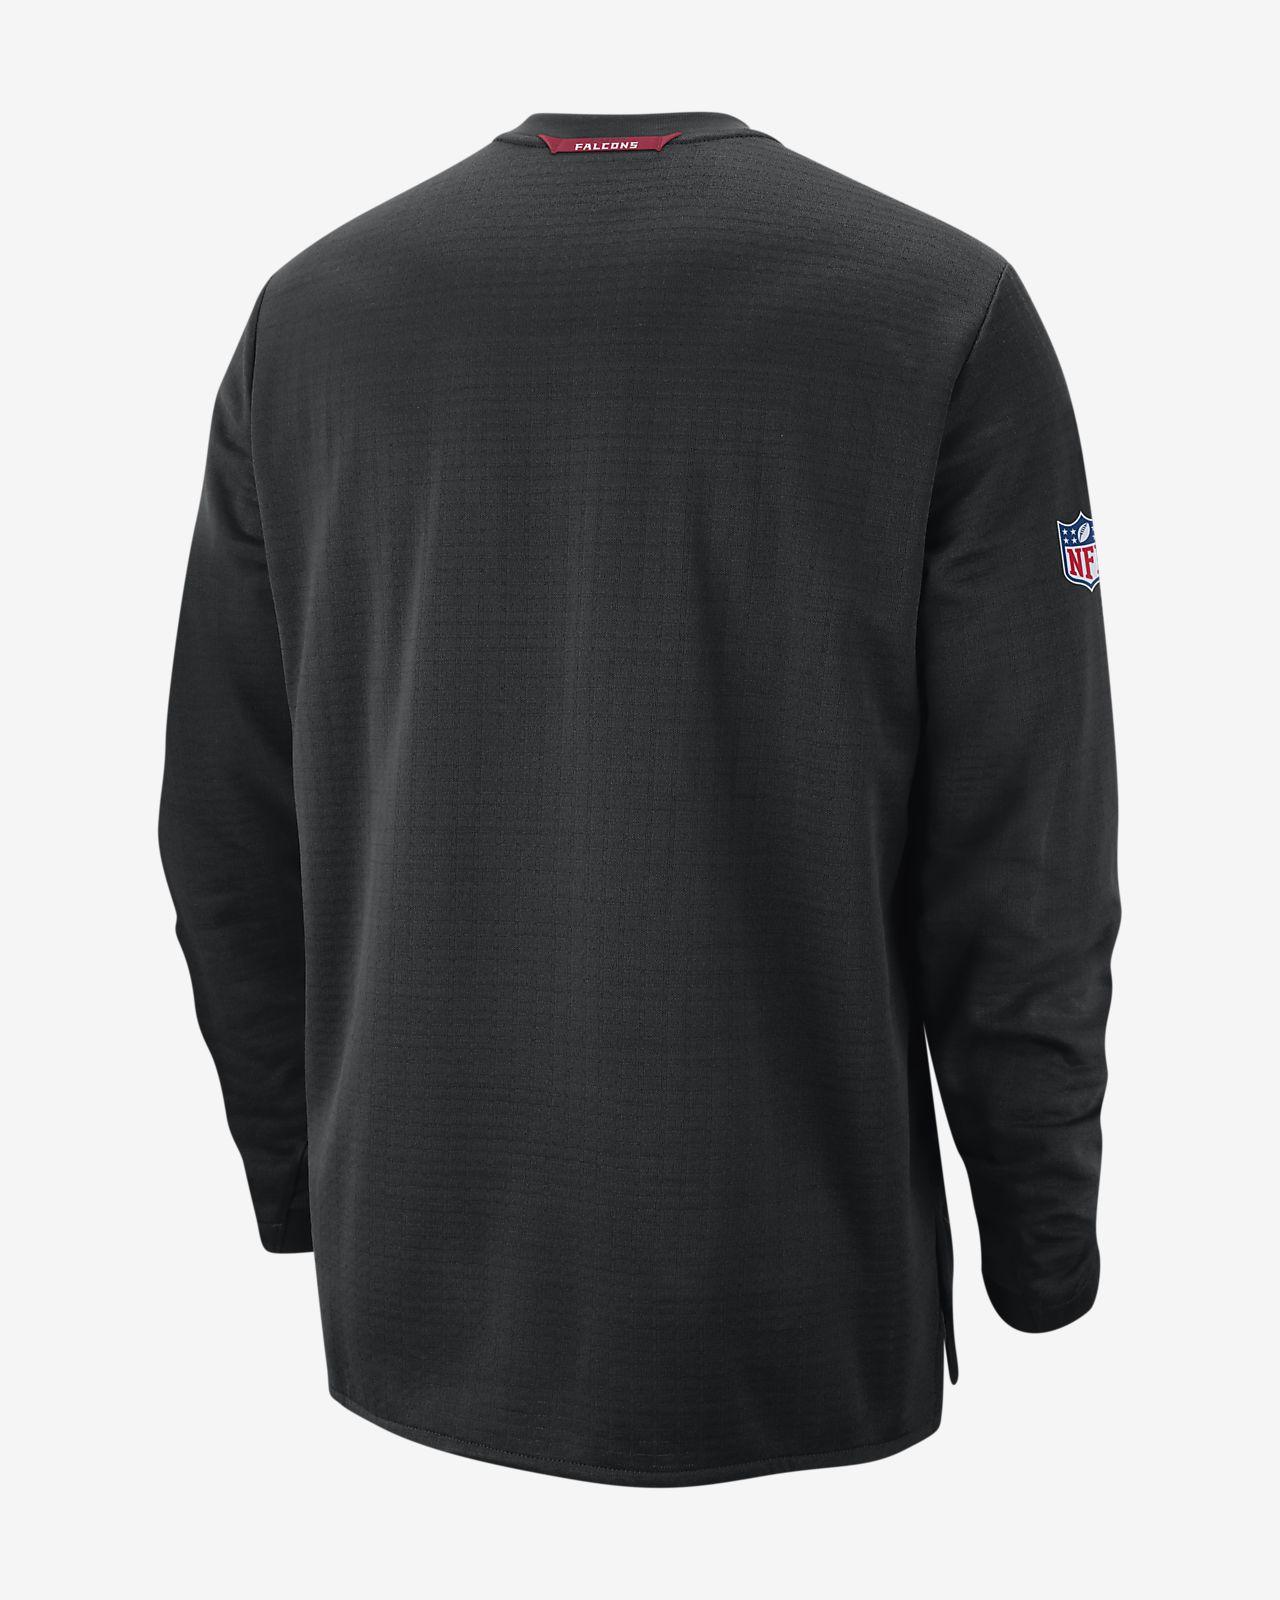 7c12b89d Nike Modern (NFL Falcons) Men's Long Sleeve Top. Nike.com